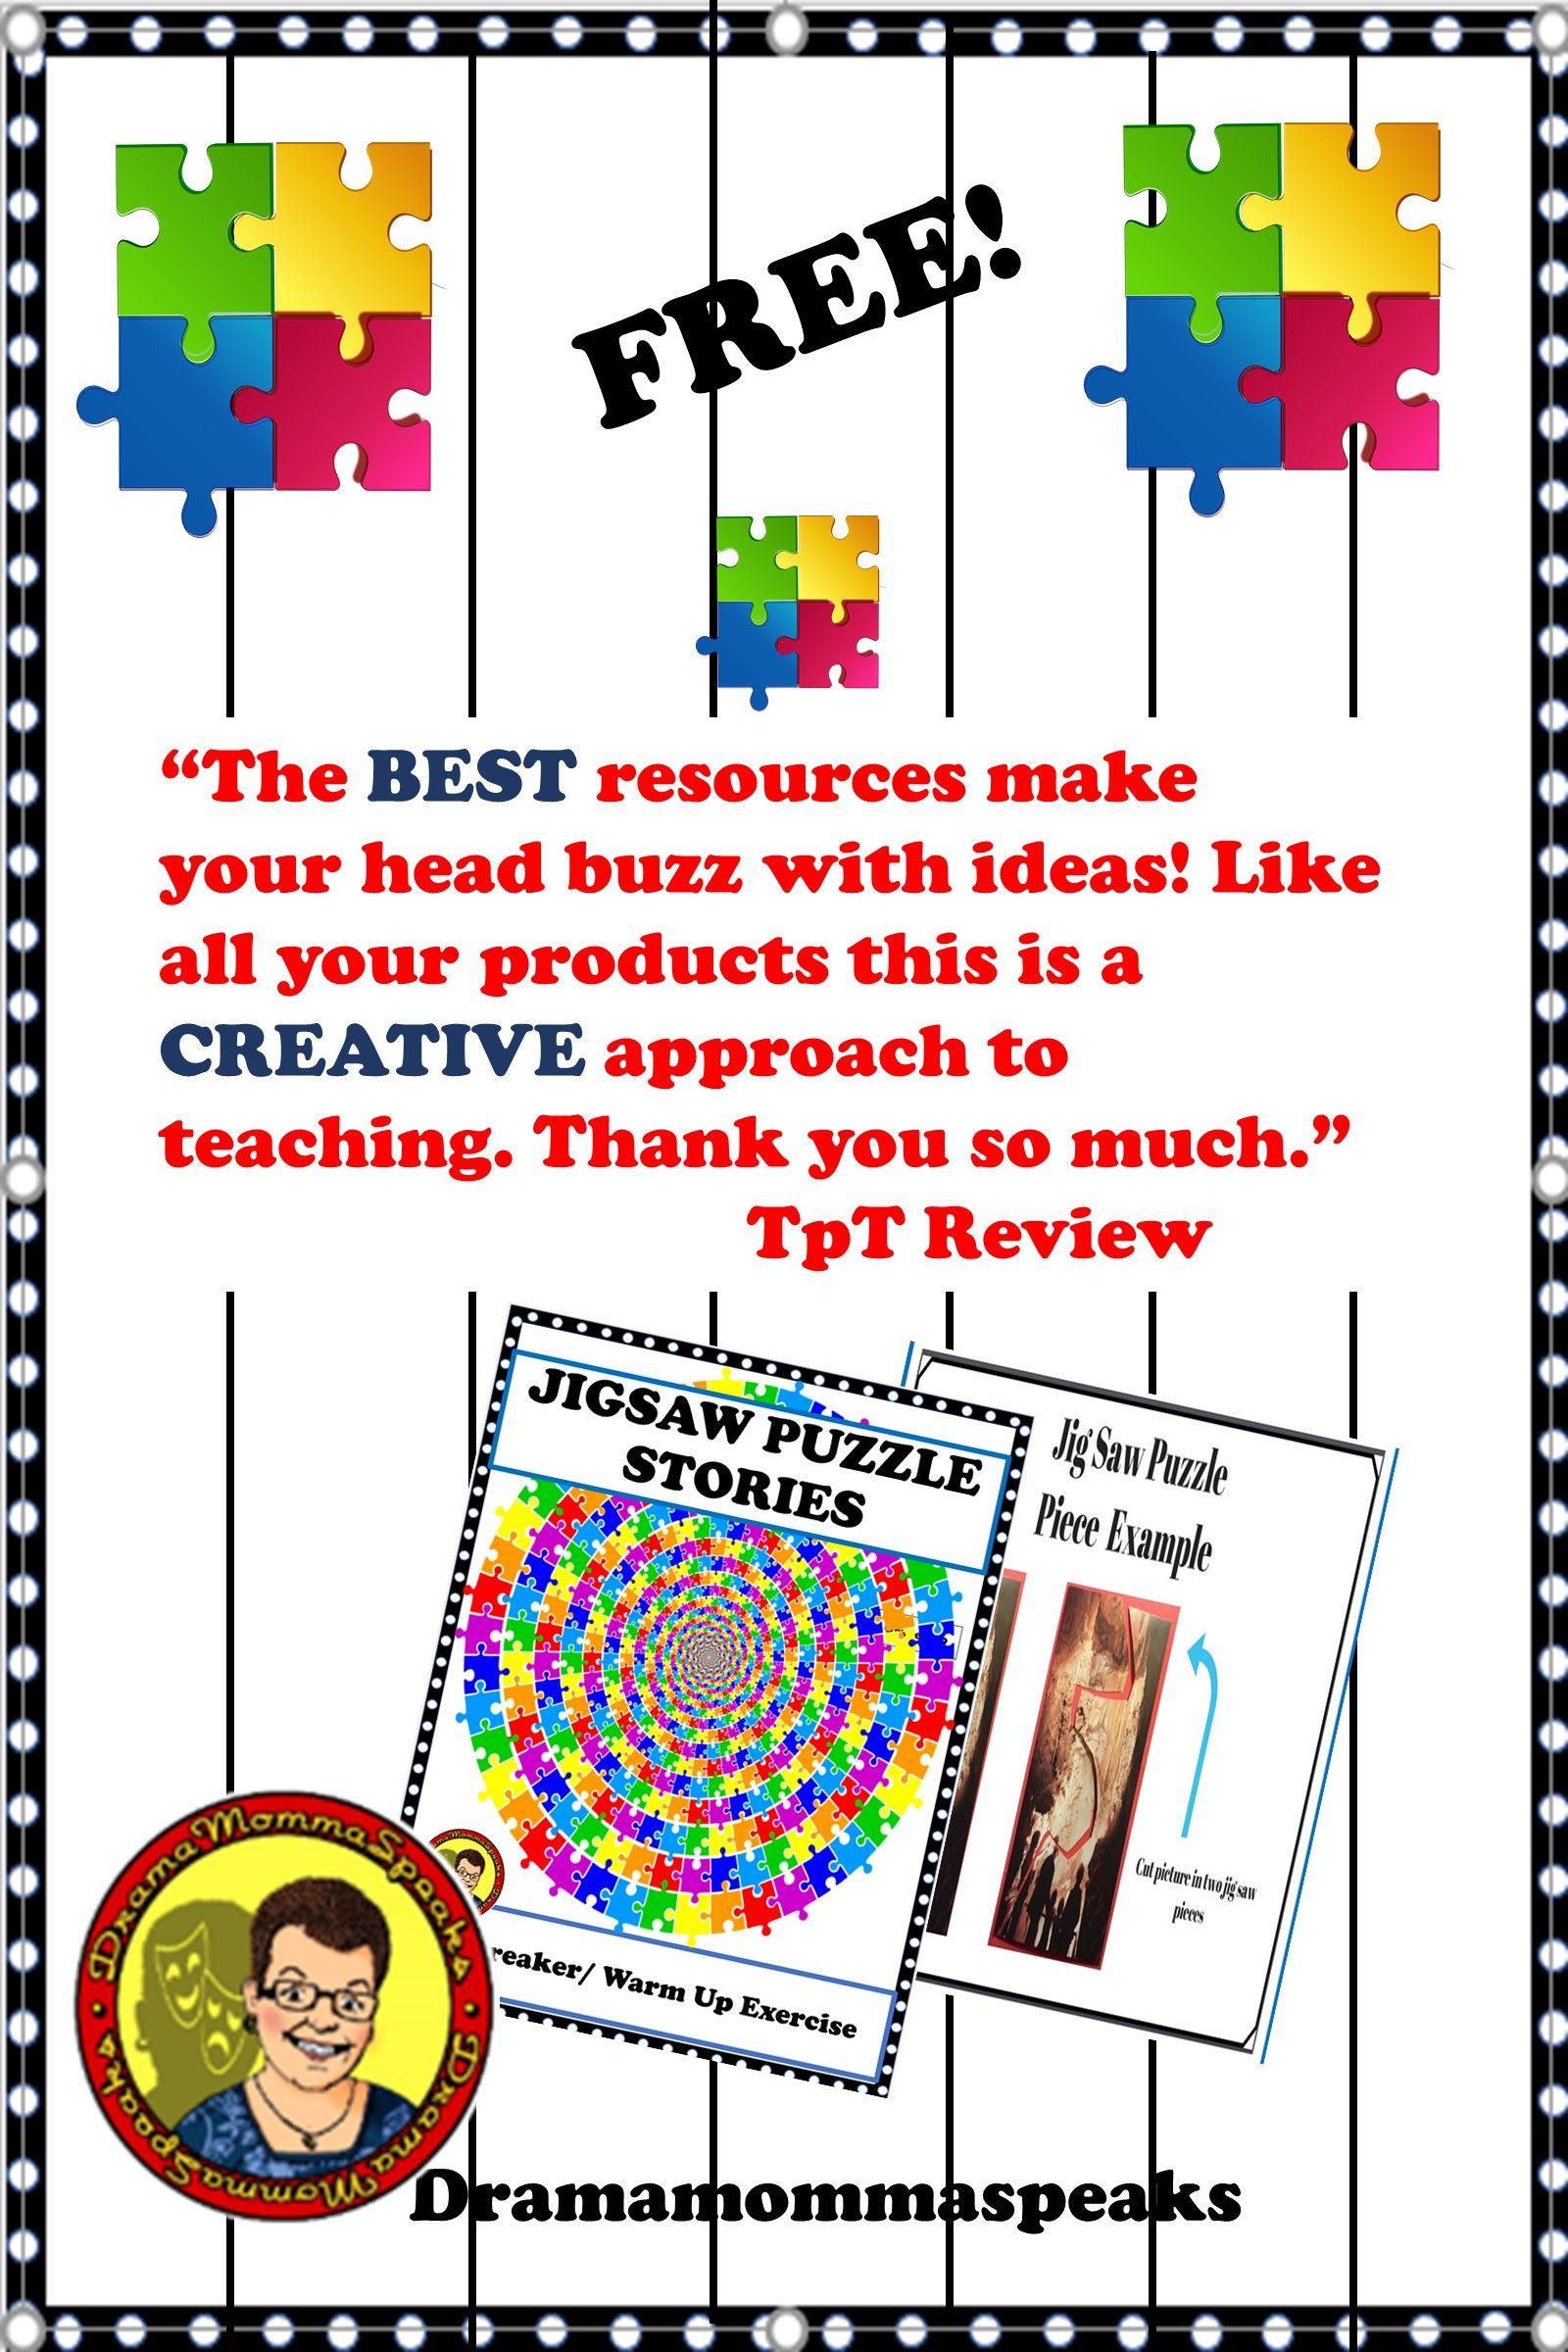 Storytelling using jig saw puzzle pieces Drama teacher